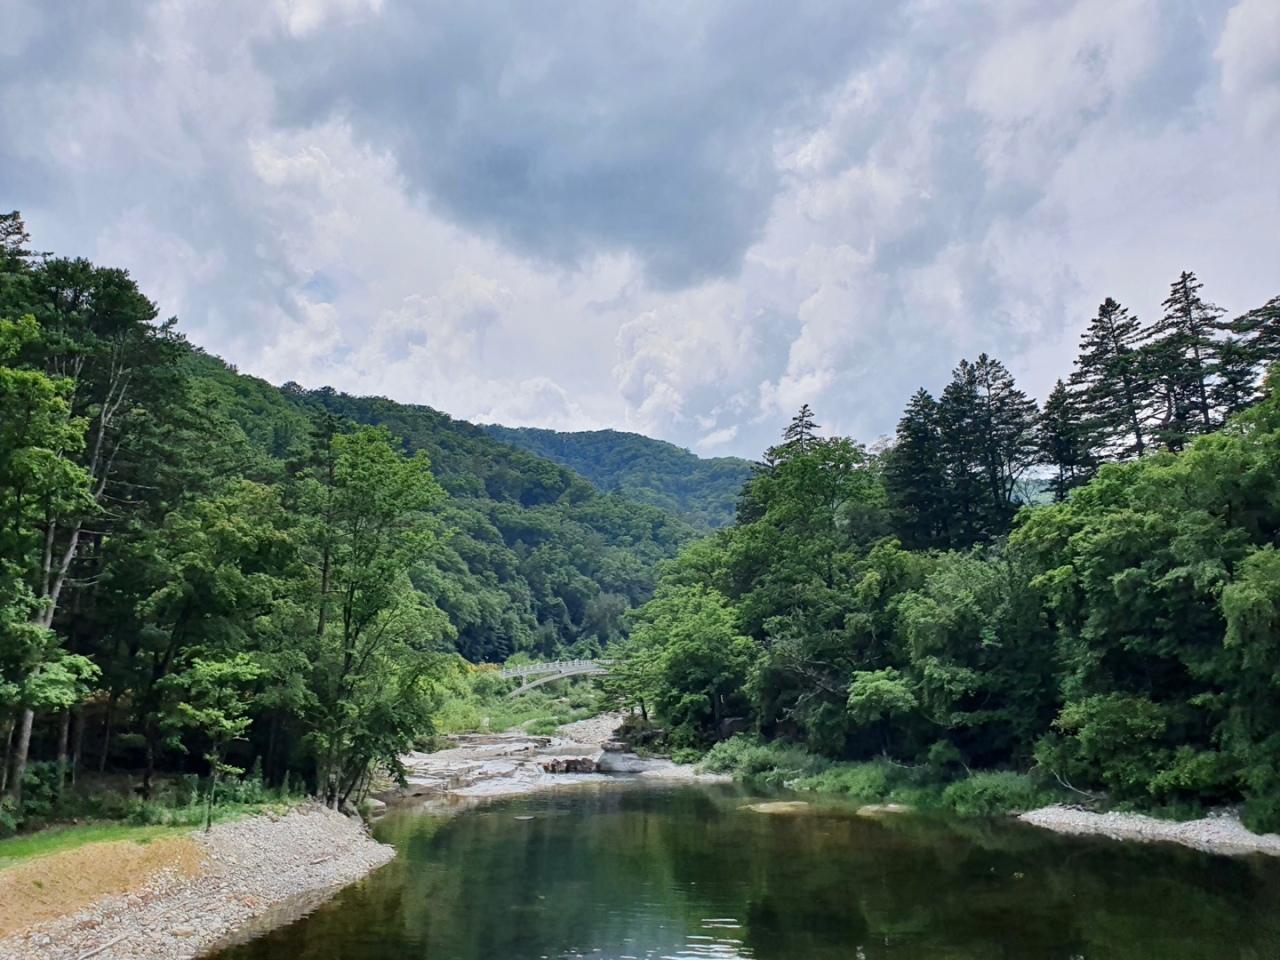 Mountain stream of Sogeum River nearby Weoljeongsa (Im Eun-byel / The Korea Herald)